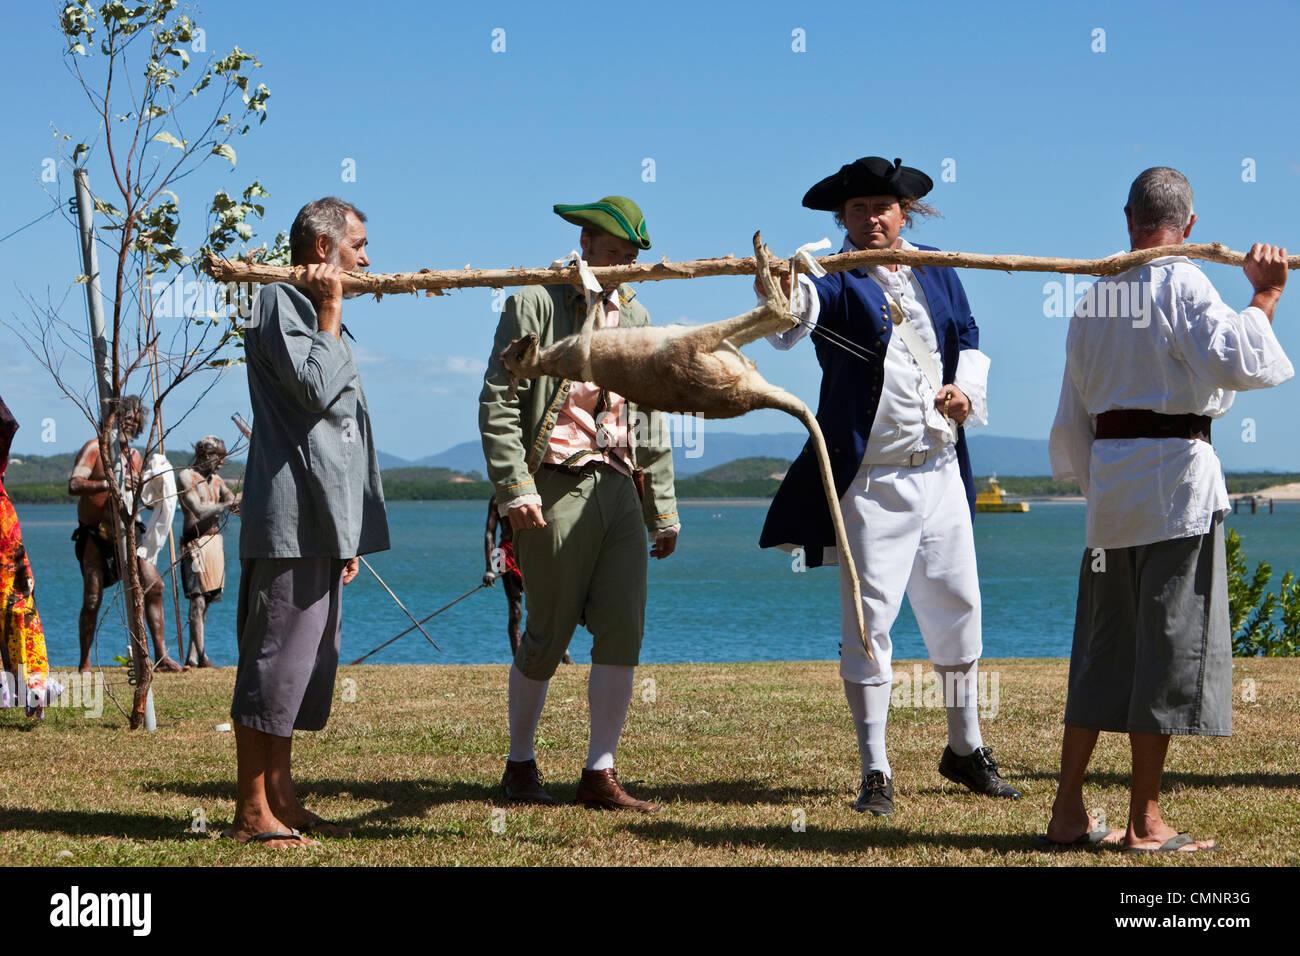 Re-enactment of Captain Cook's landing at Cooktown.  Cooktown, Queensland, Australia - Stock Image